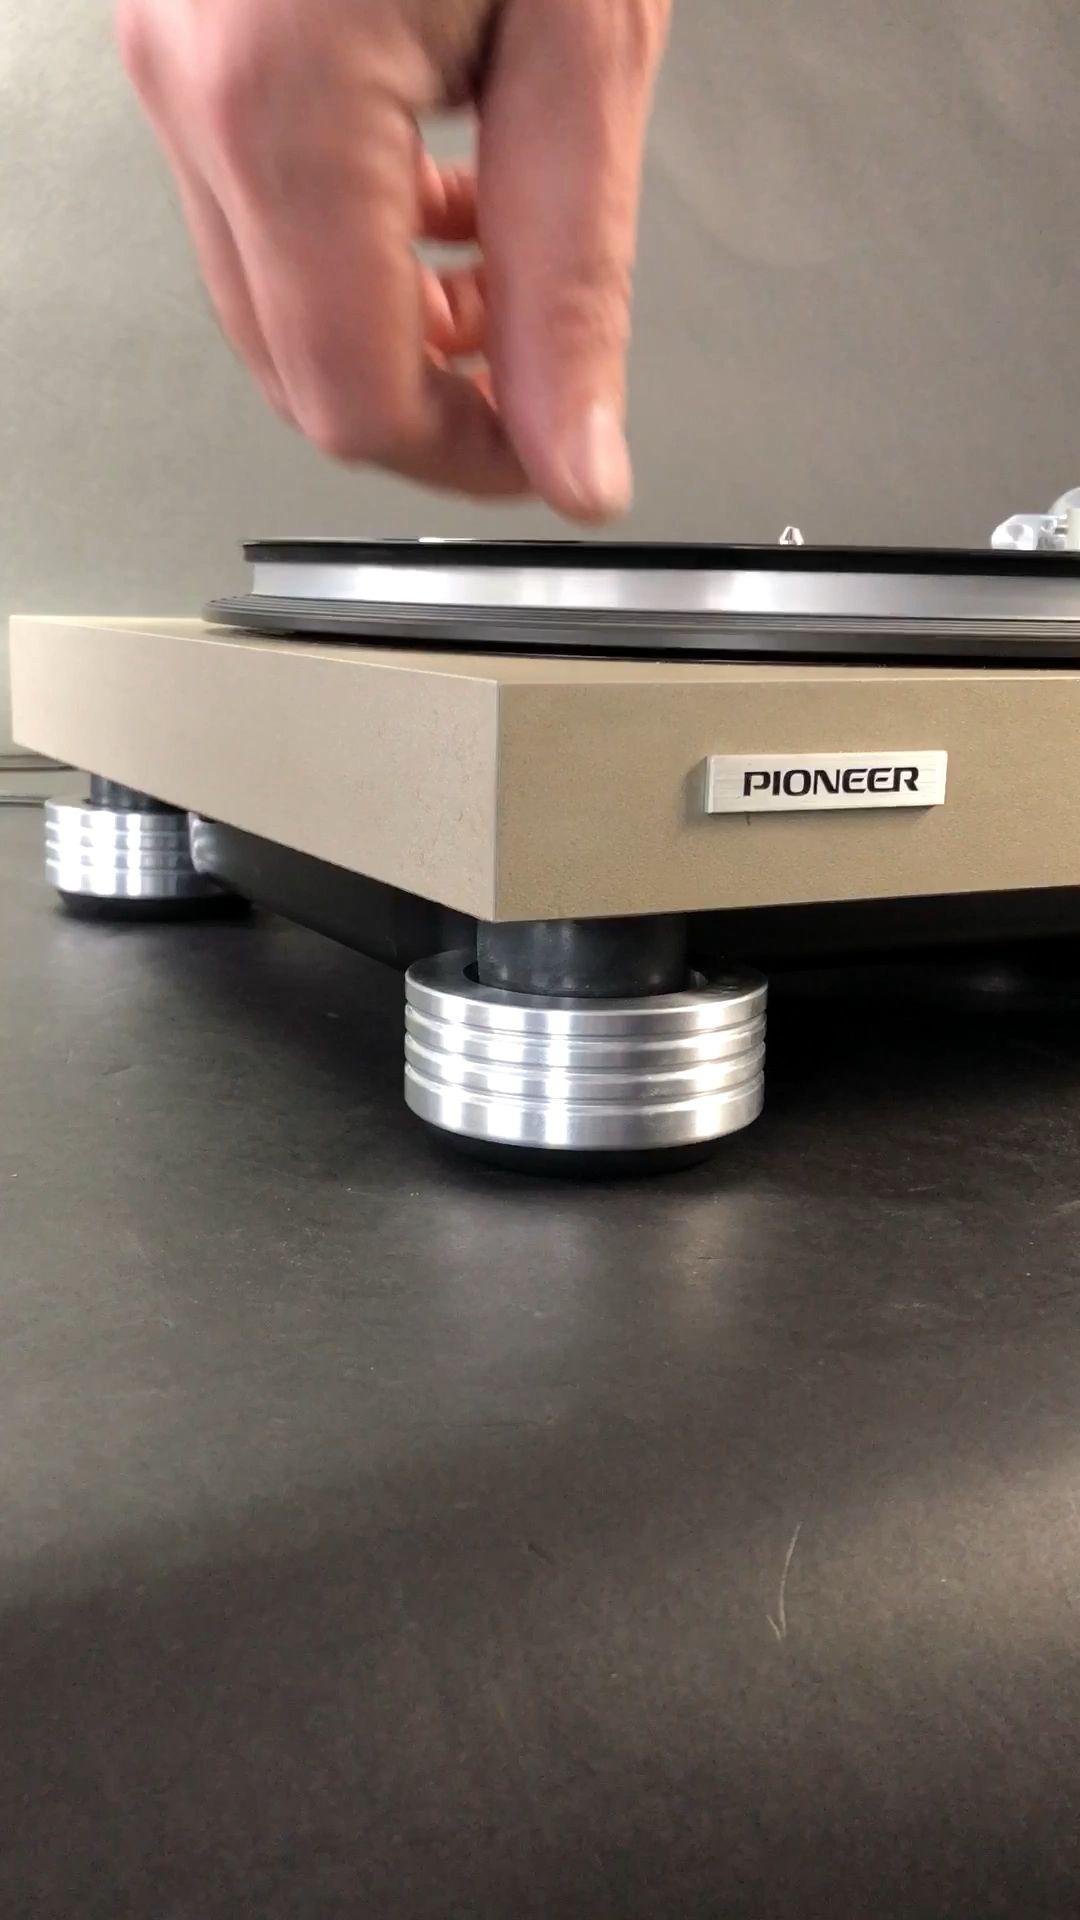 Upgraded Derek's vintage Pioneer PL518 Turntable to Mnpctech Anti-Vibration Isolation Feet Linked below